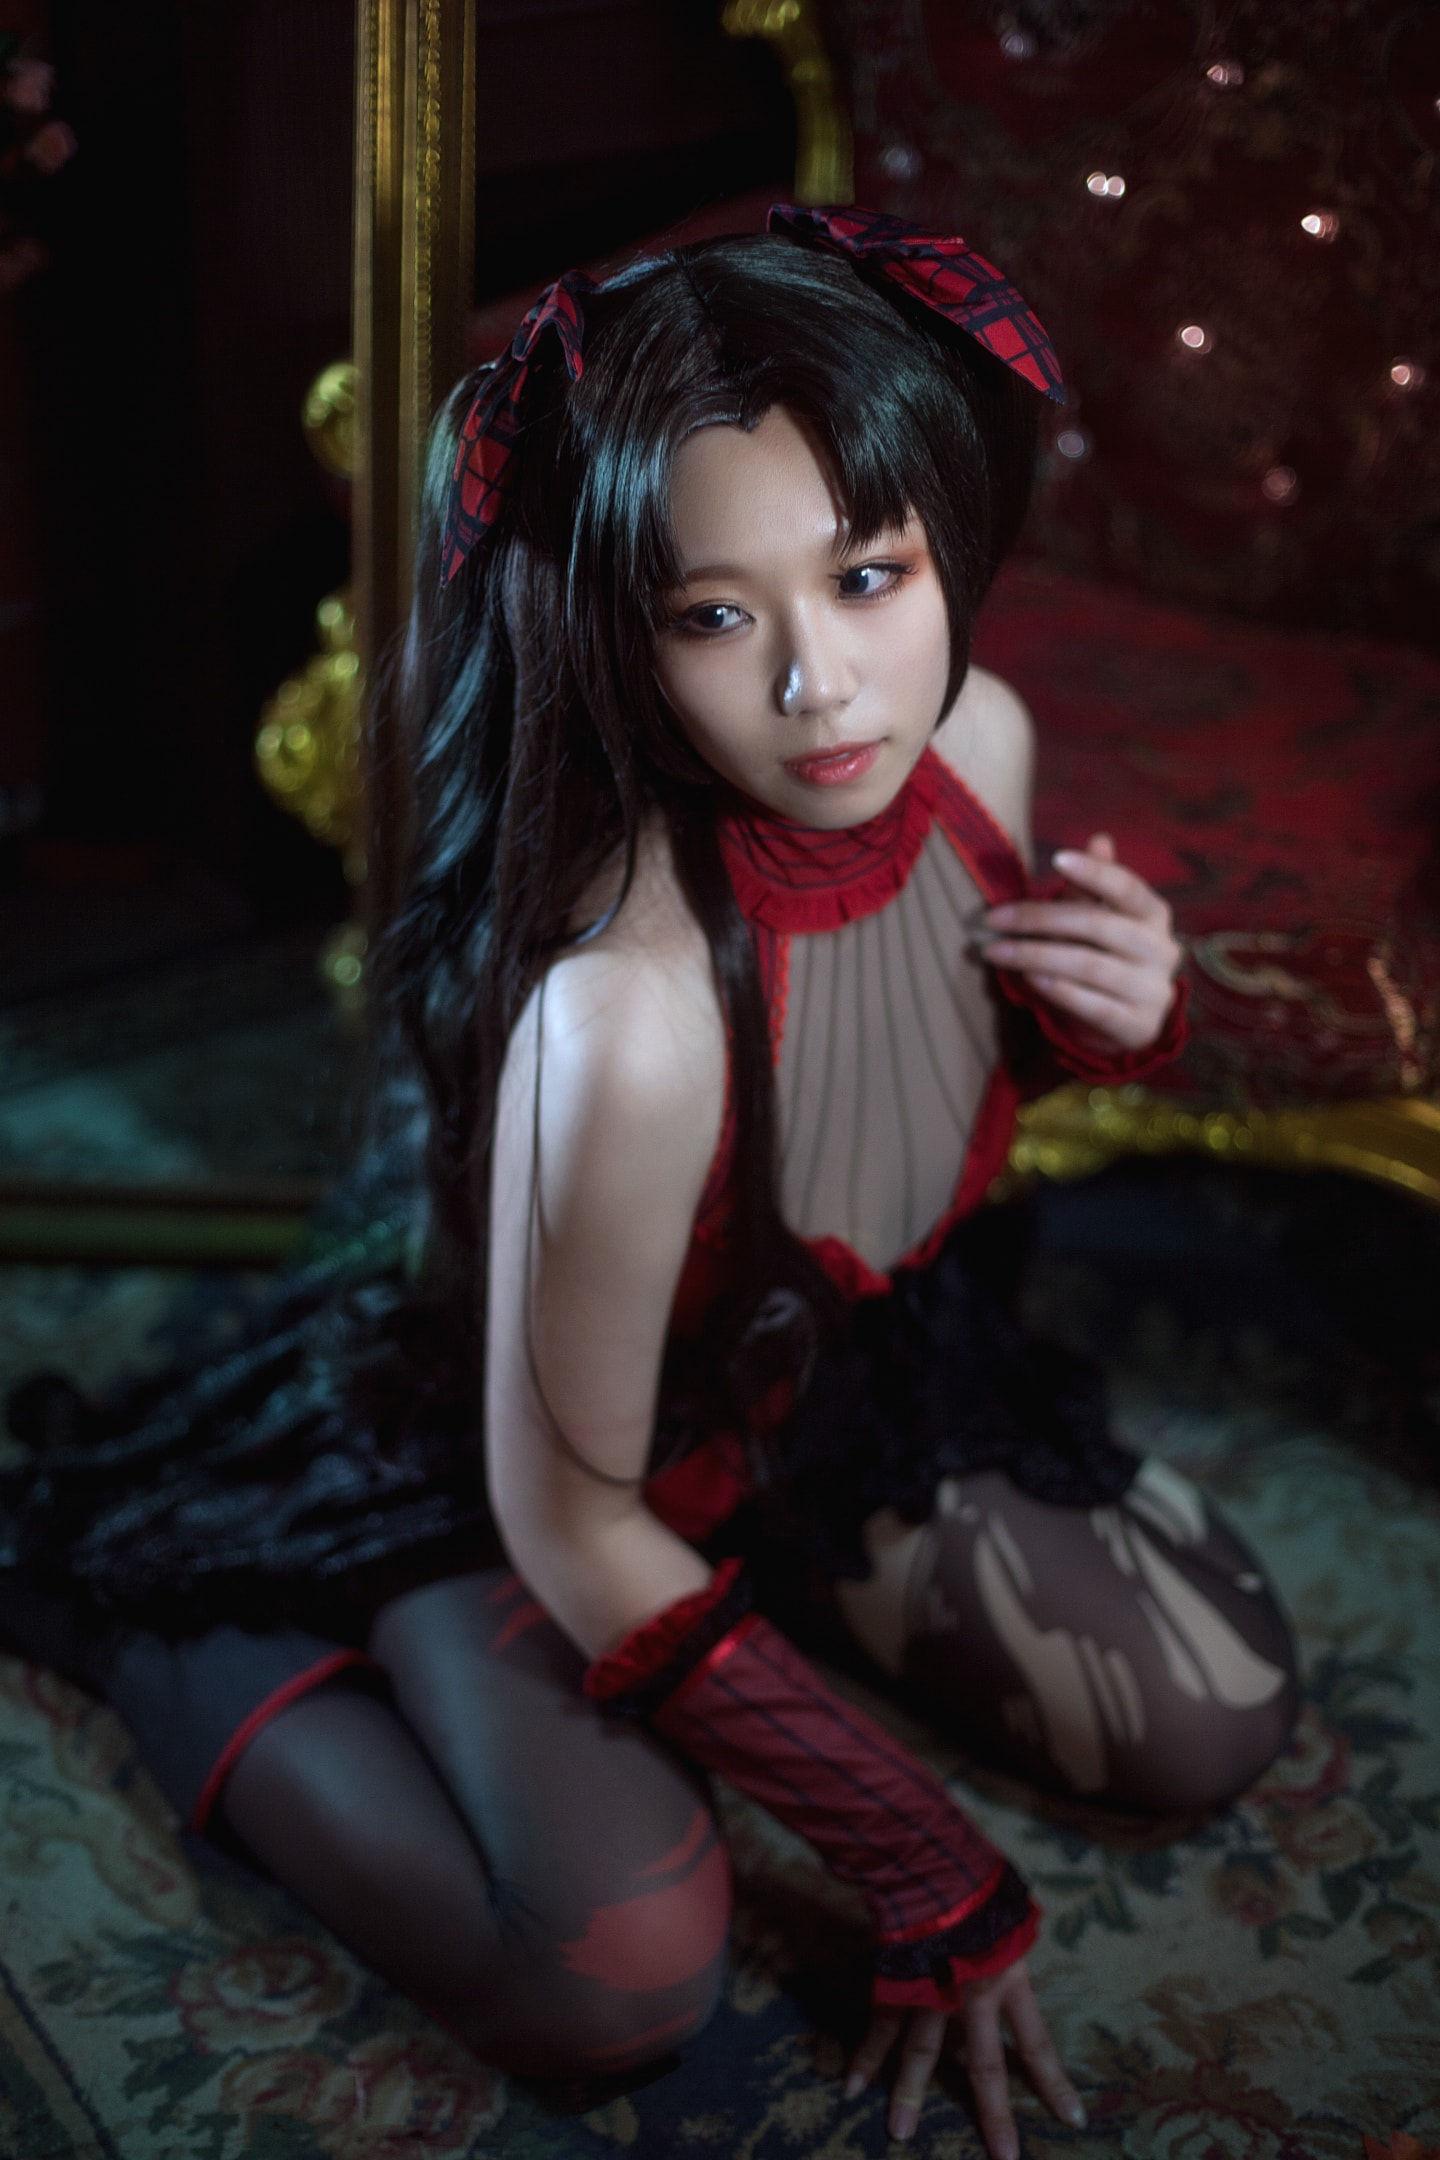 FATE 远坂凛cosplay 月之女王插图(6)